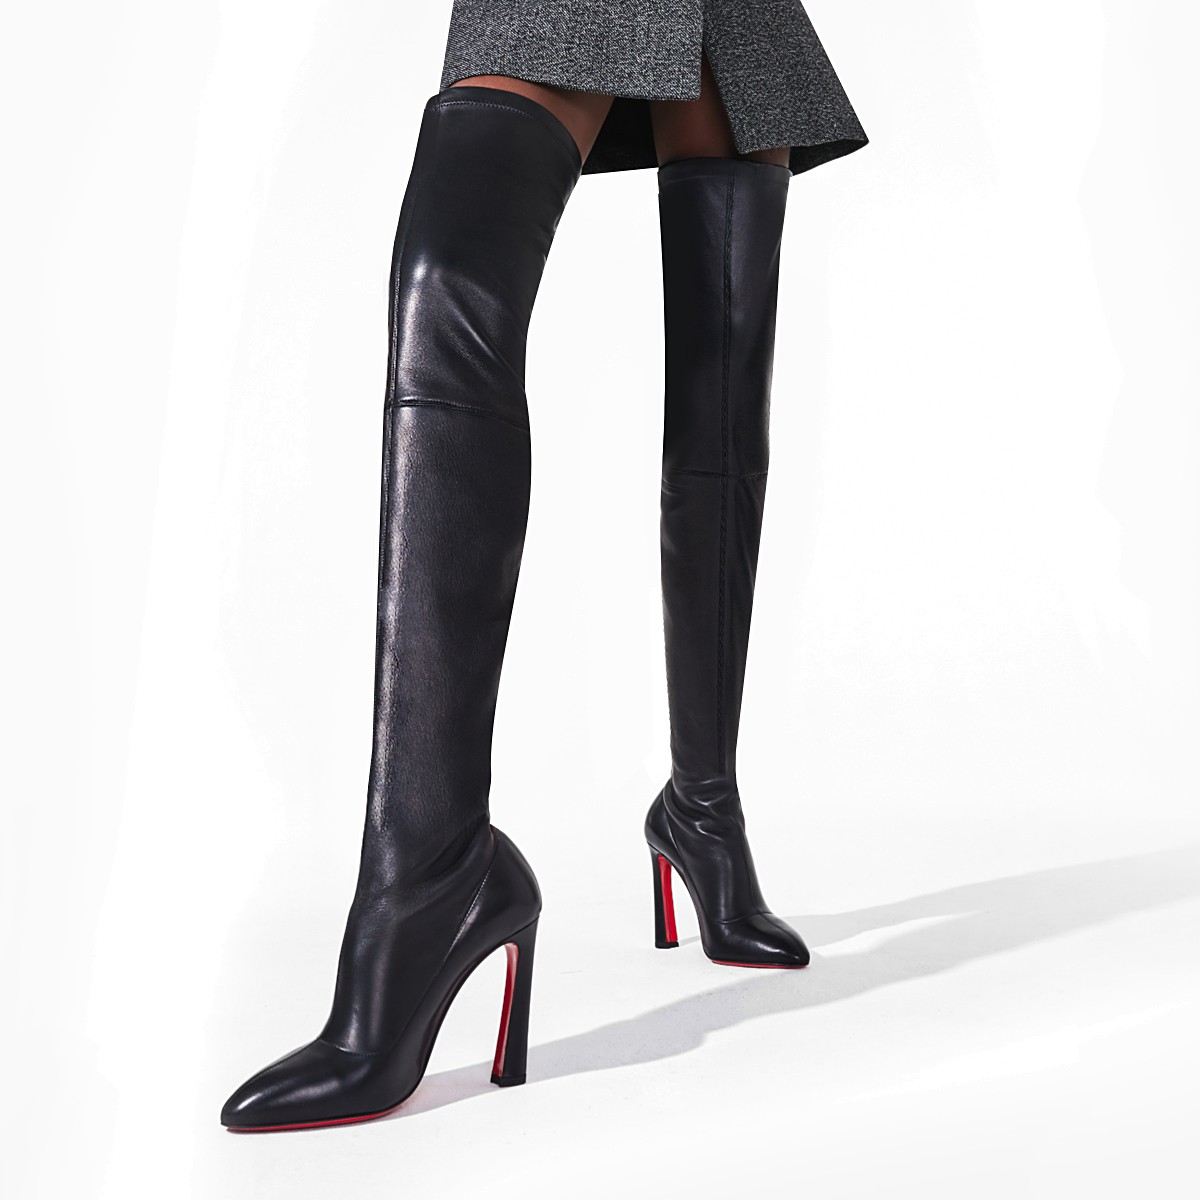 Shoes - Eleonor Alta - Christian Louboutin